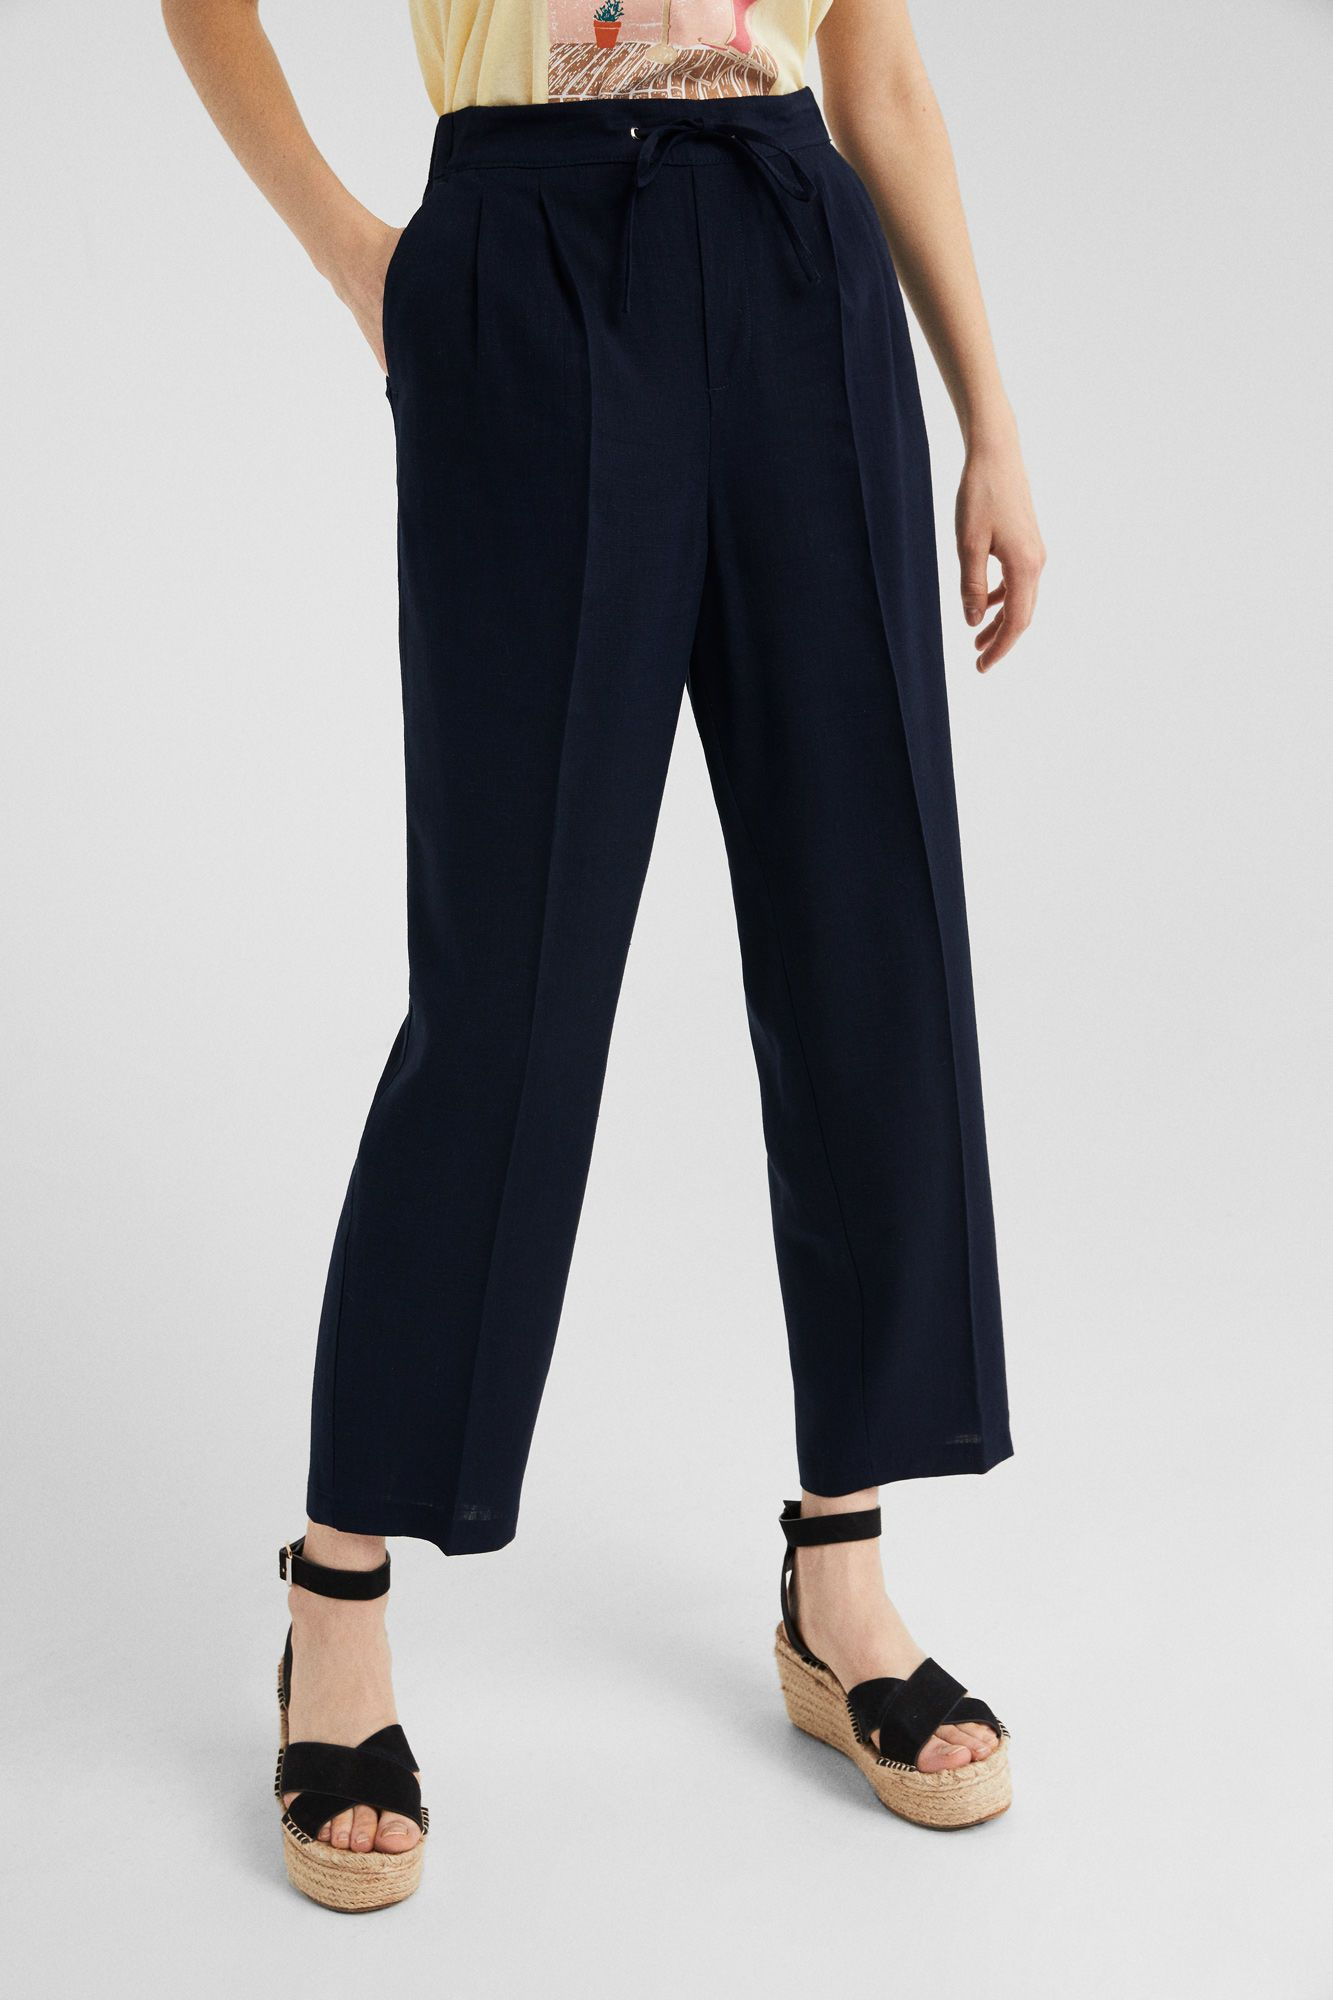 Springfield Pantalon Jogger Fluido Fashion Capri Pants Pants